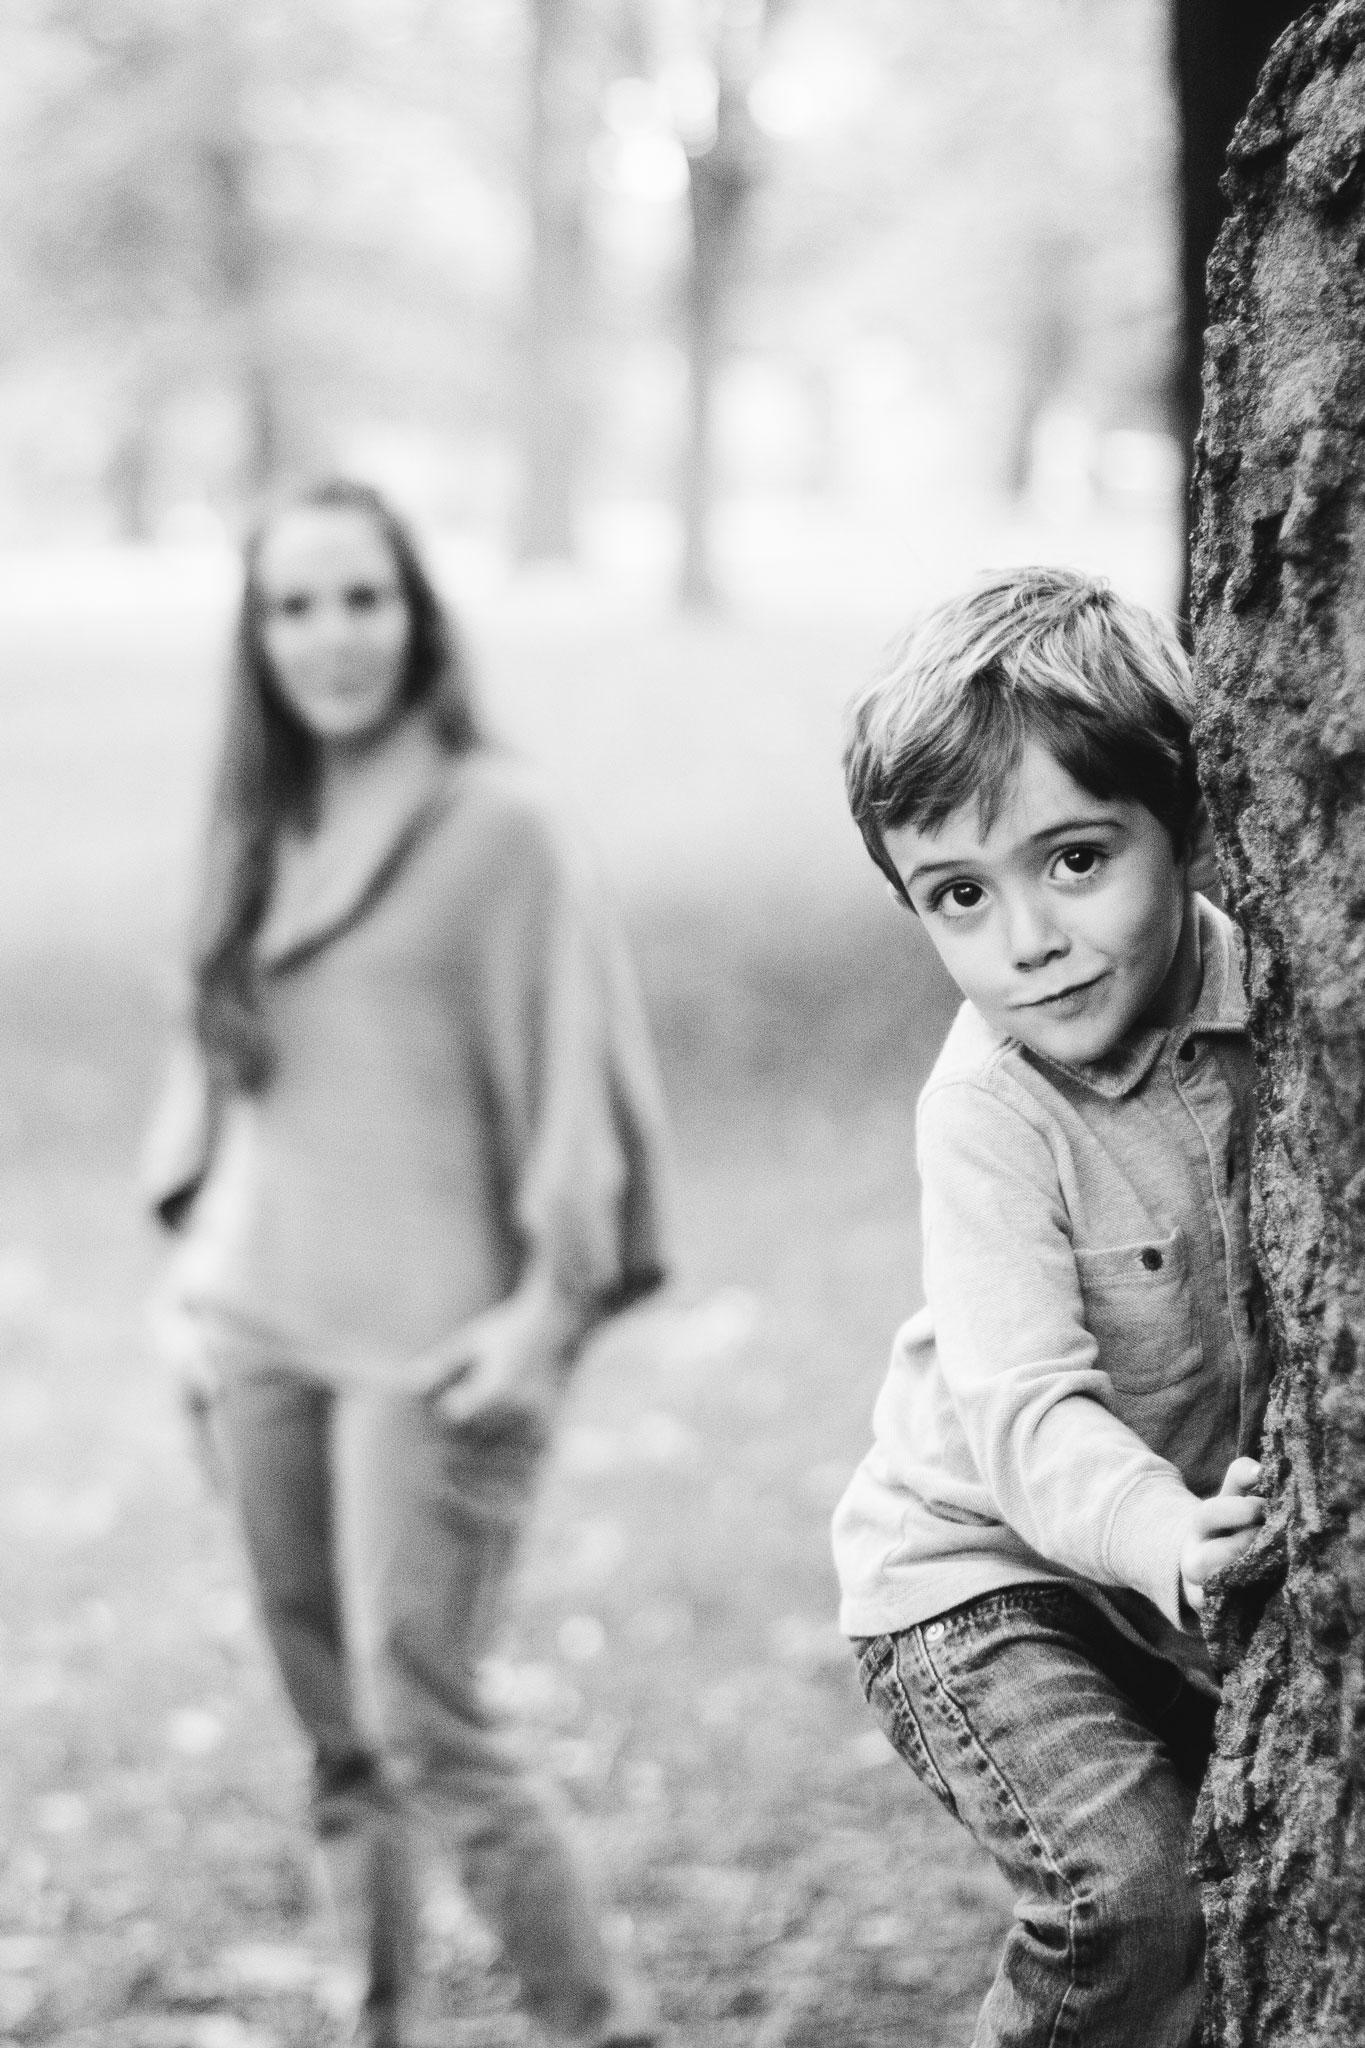 boy-climb-tree.jpg